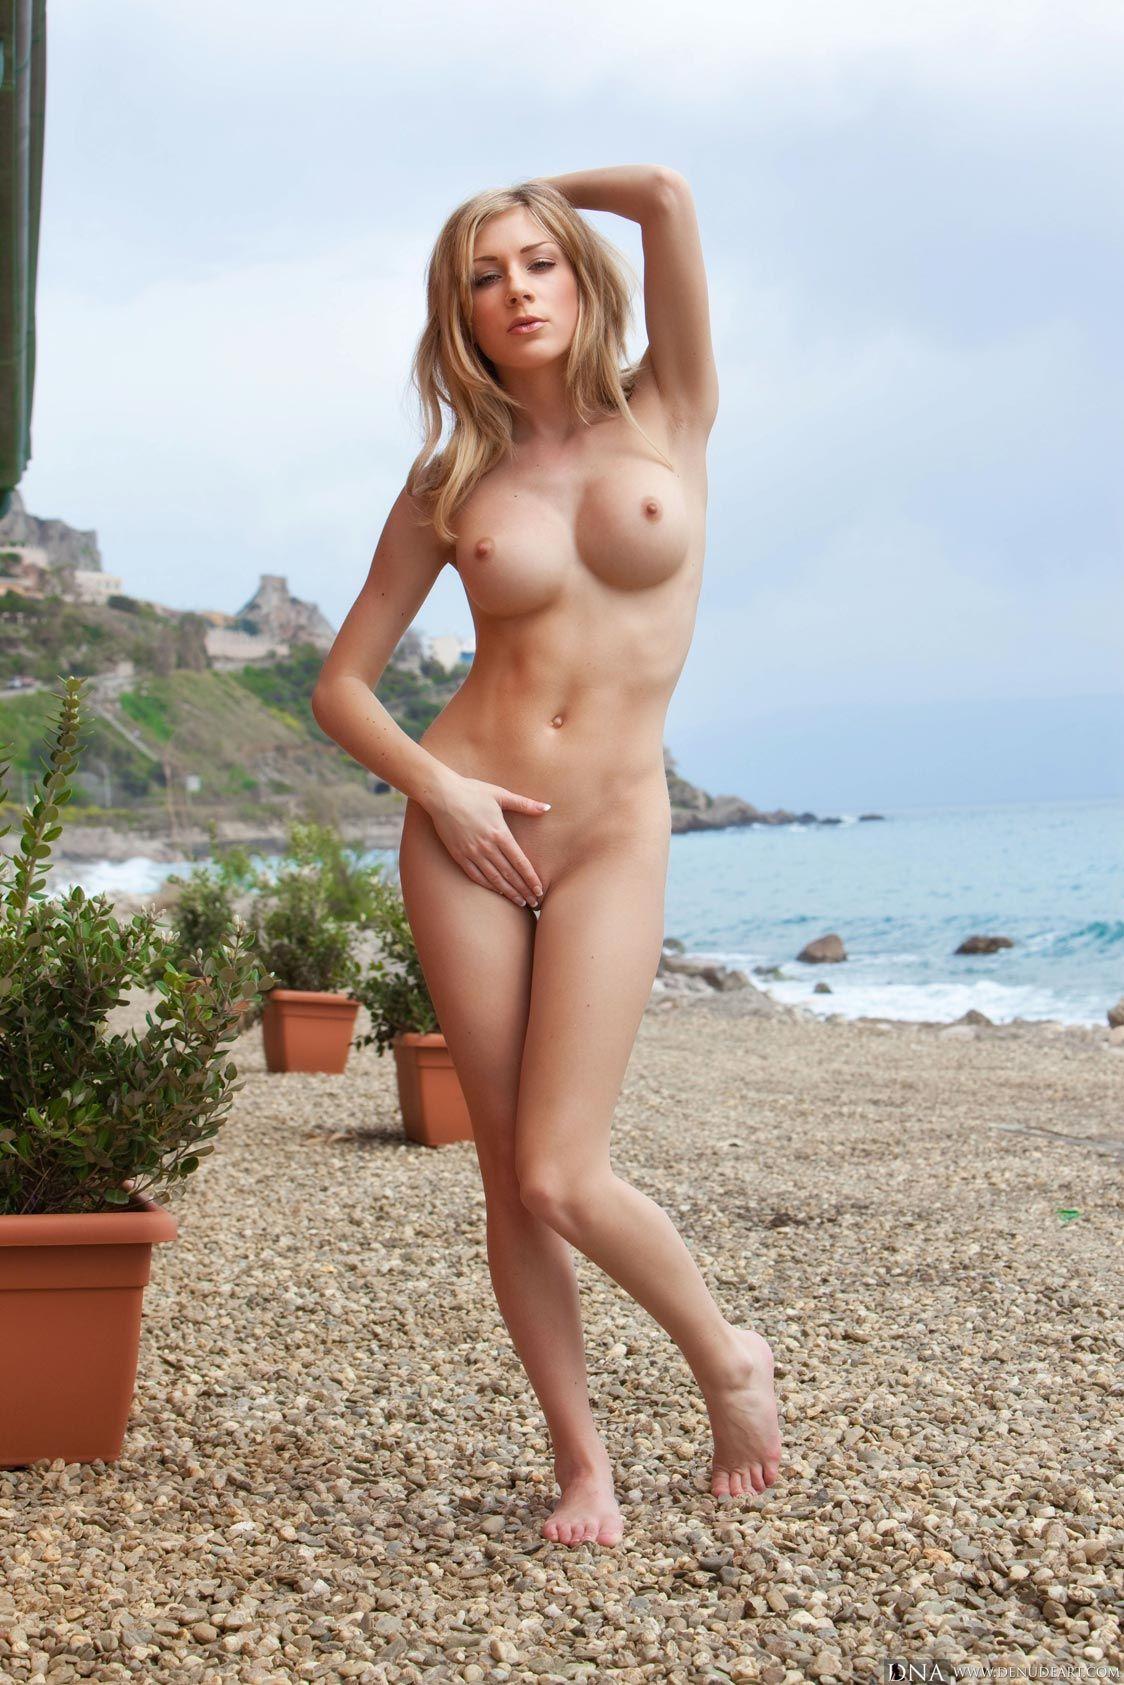 Julia crown nude pics